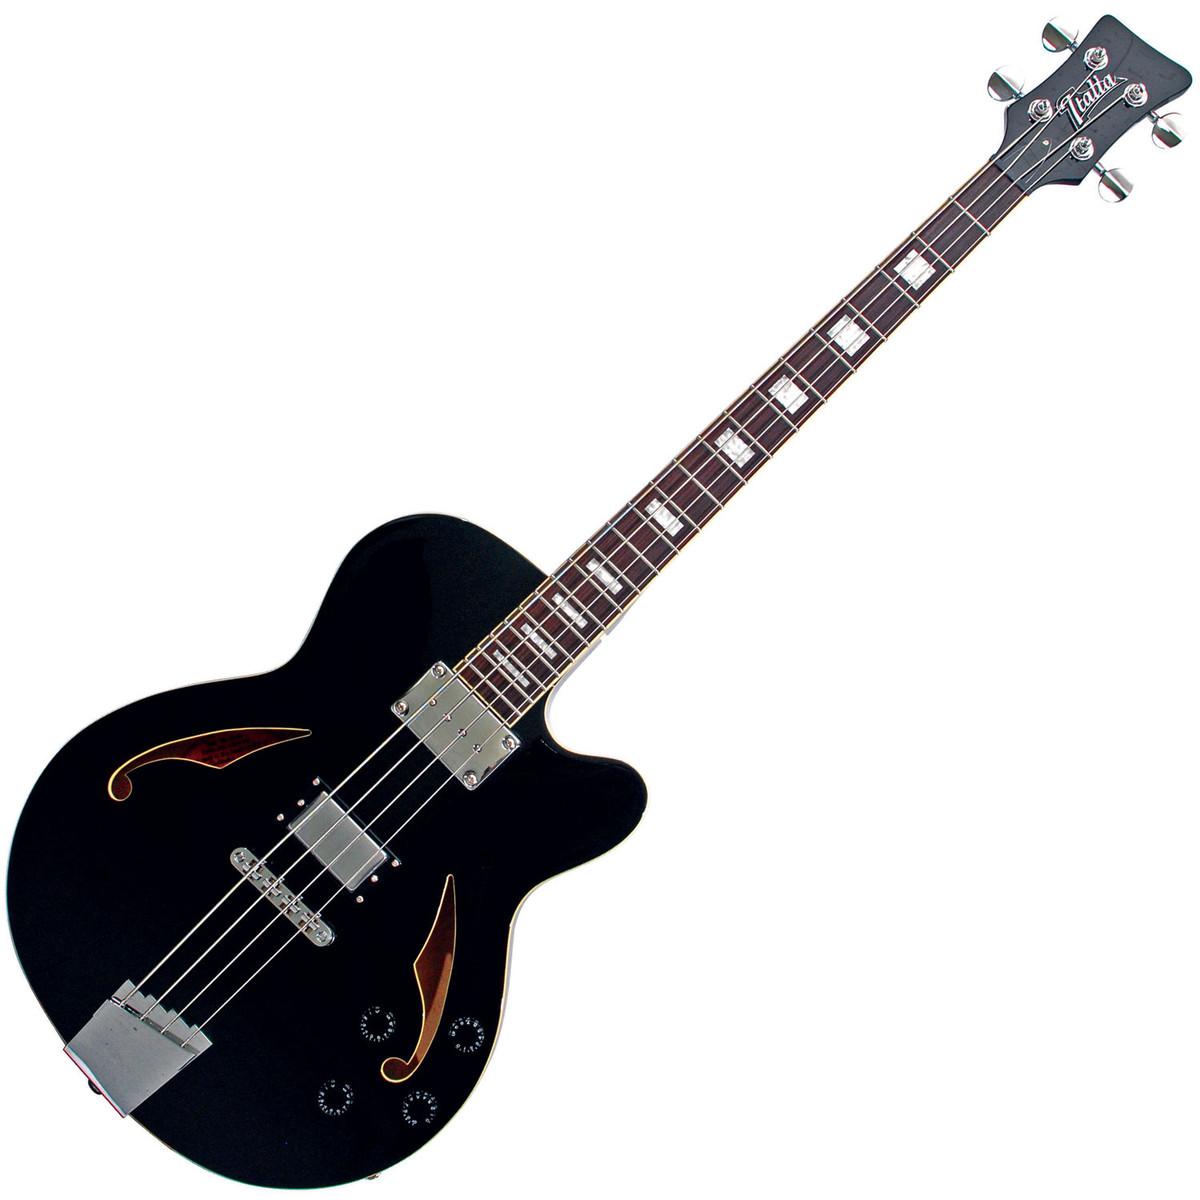 italia torino semi hollow body bass guitar black with gig bag at. Black Bedroom Furniture Sets. Home Design Ideas